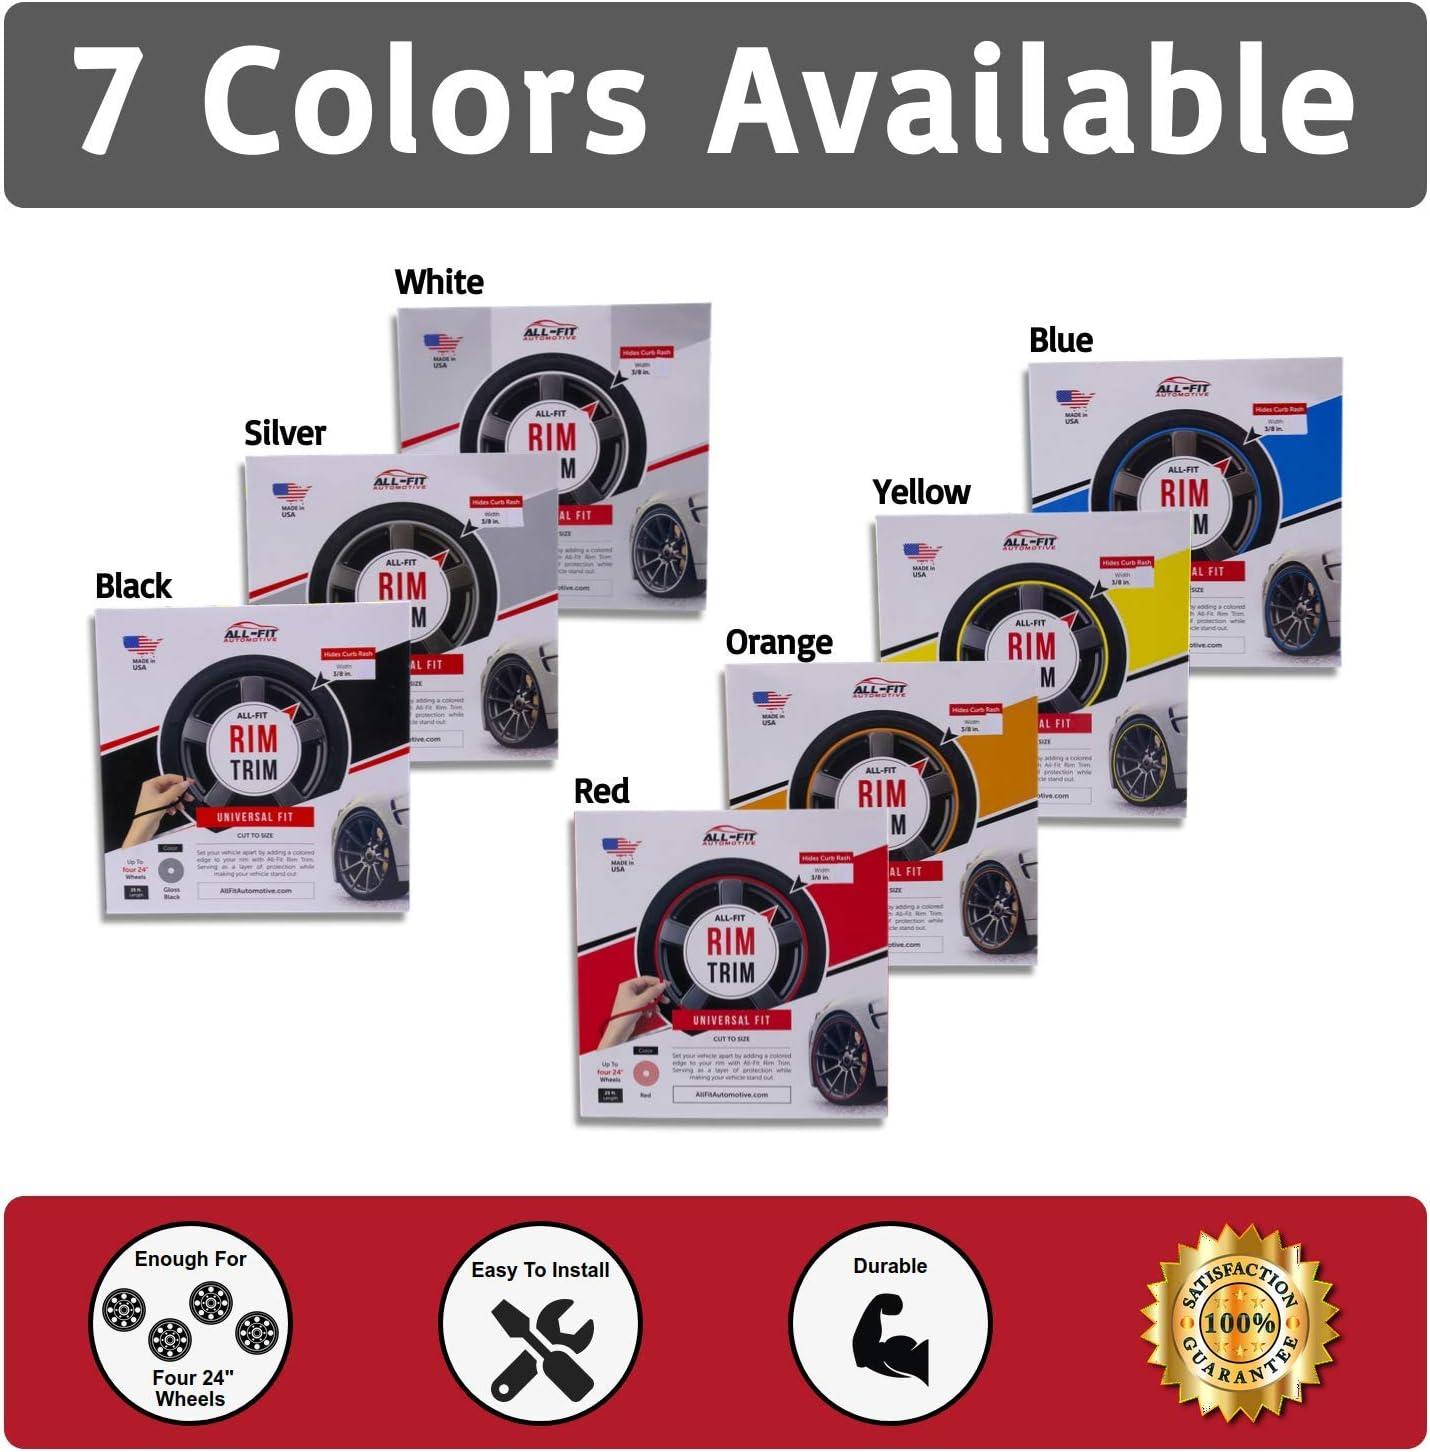 All-Fit Rim Trim Wheel Protection Strips for Curb Rash Prevention Universal Fit Orange